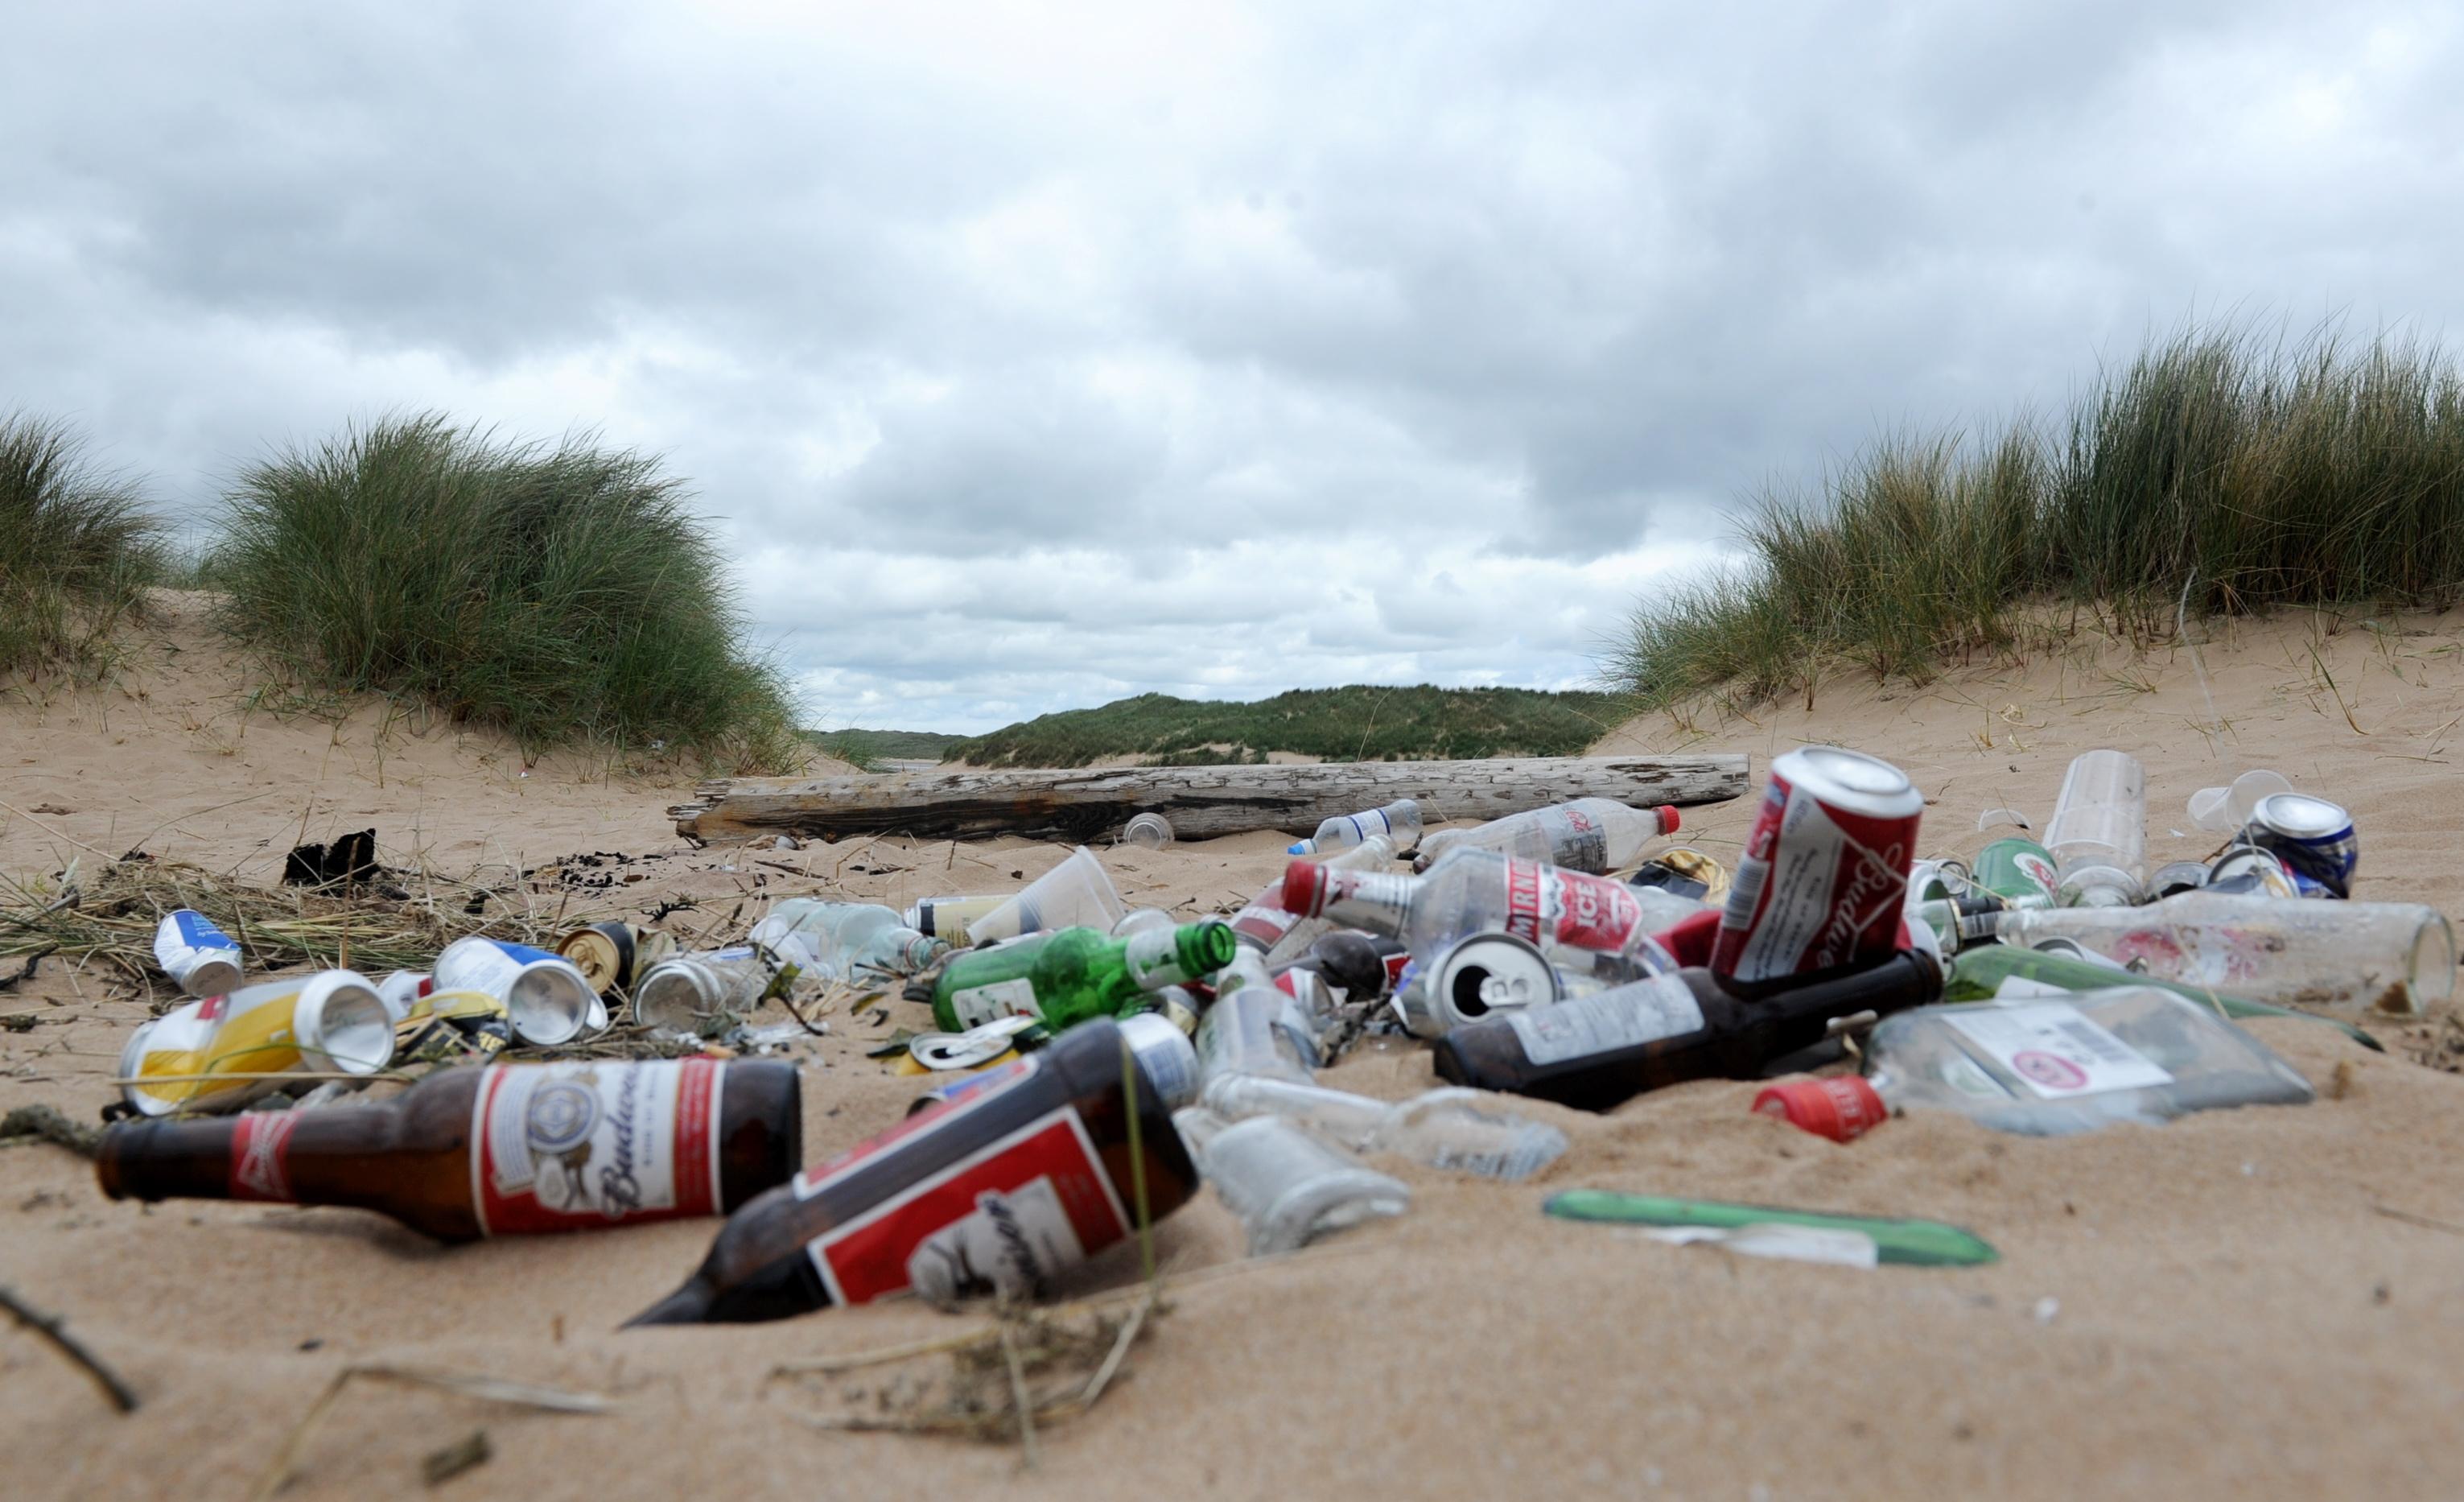 Litter in the dunes at Newburgh beach.